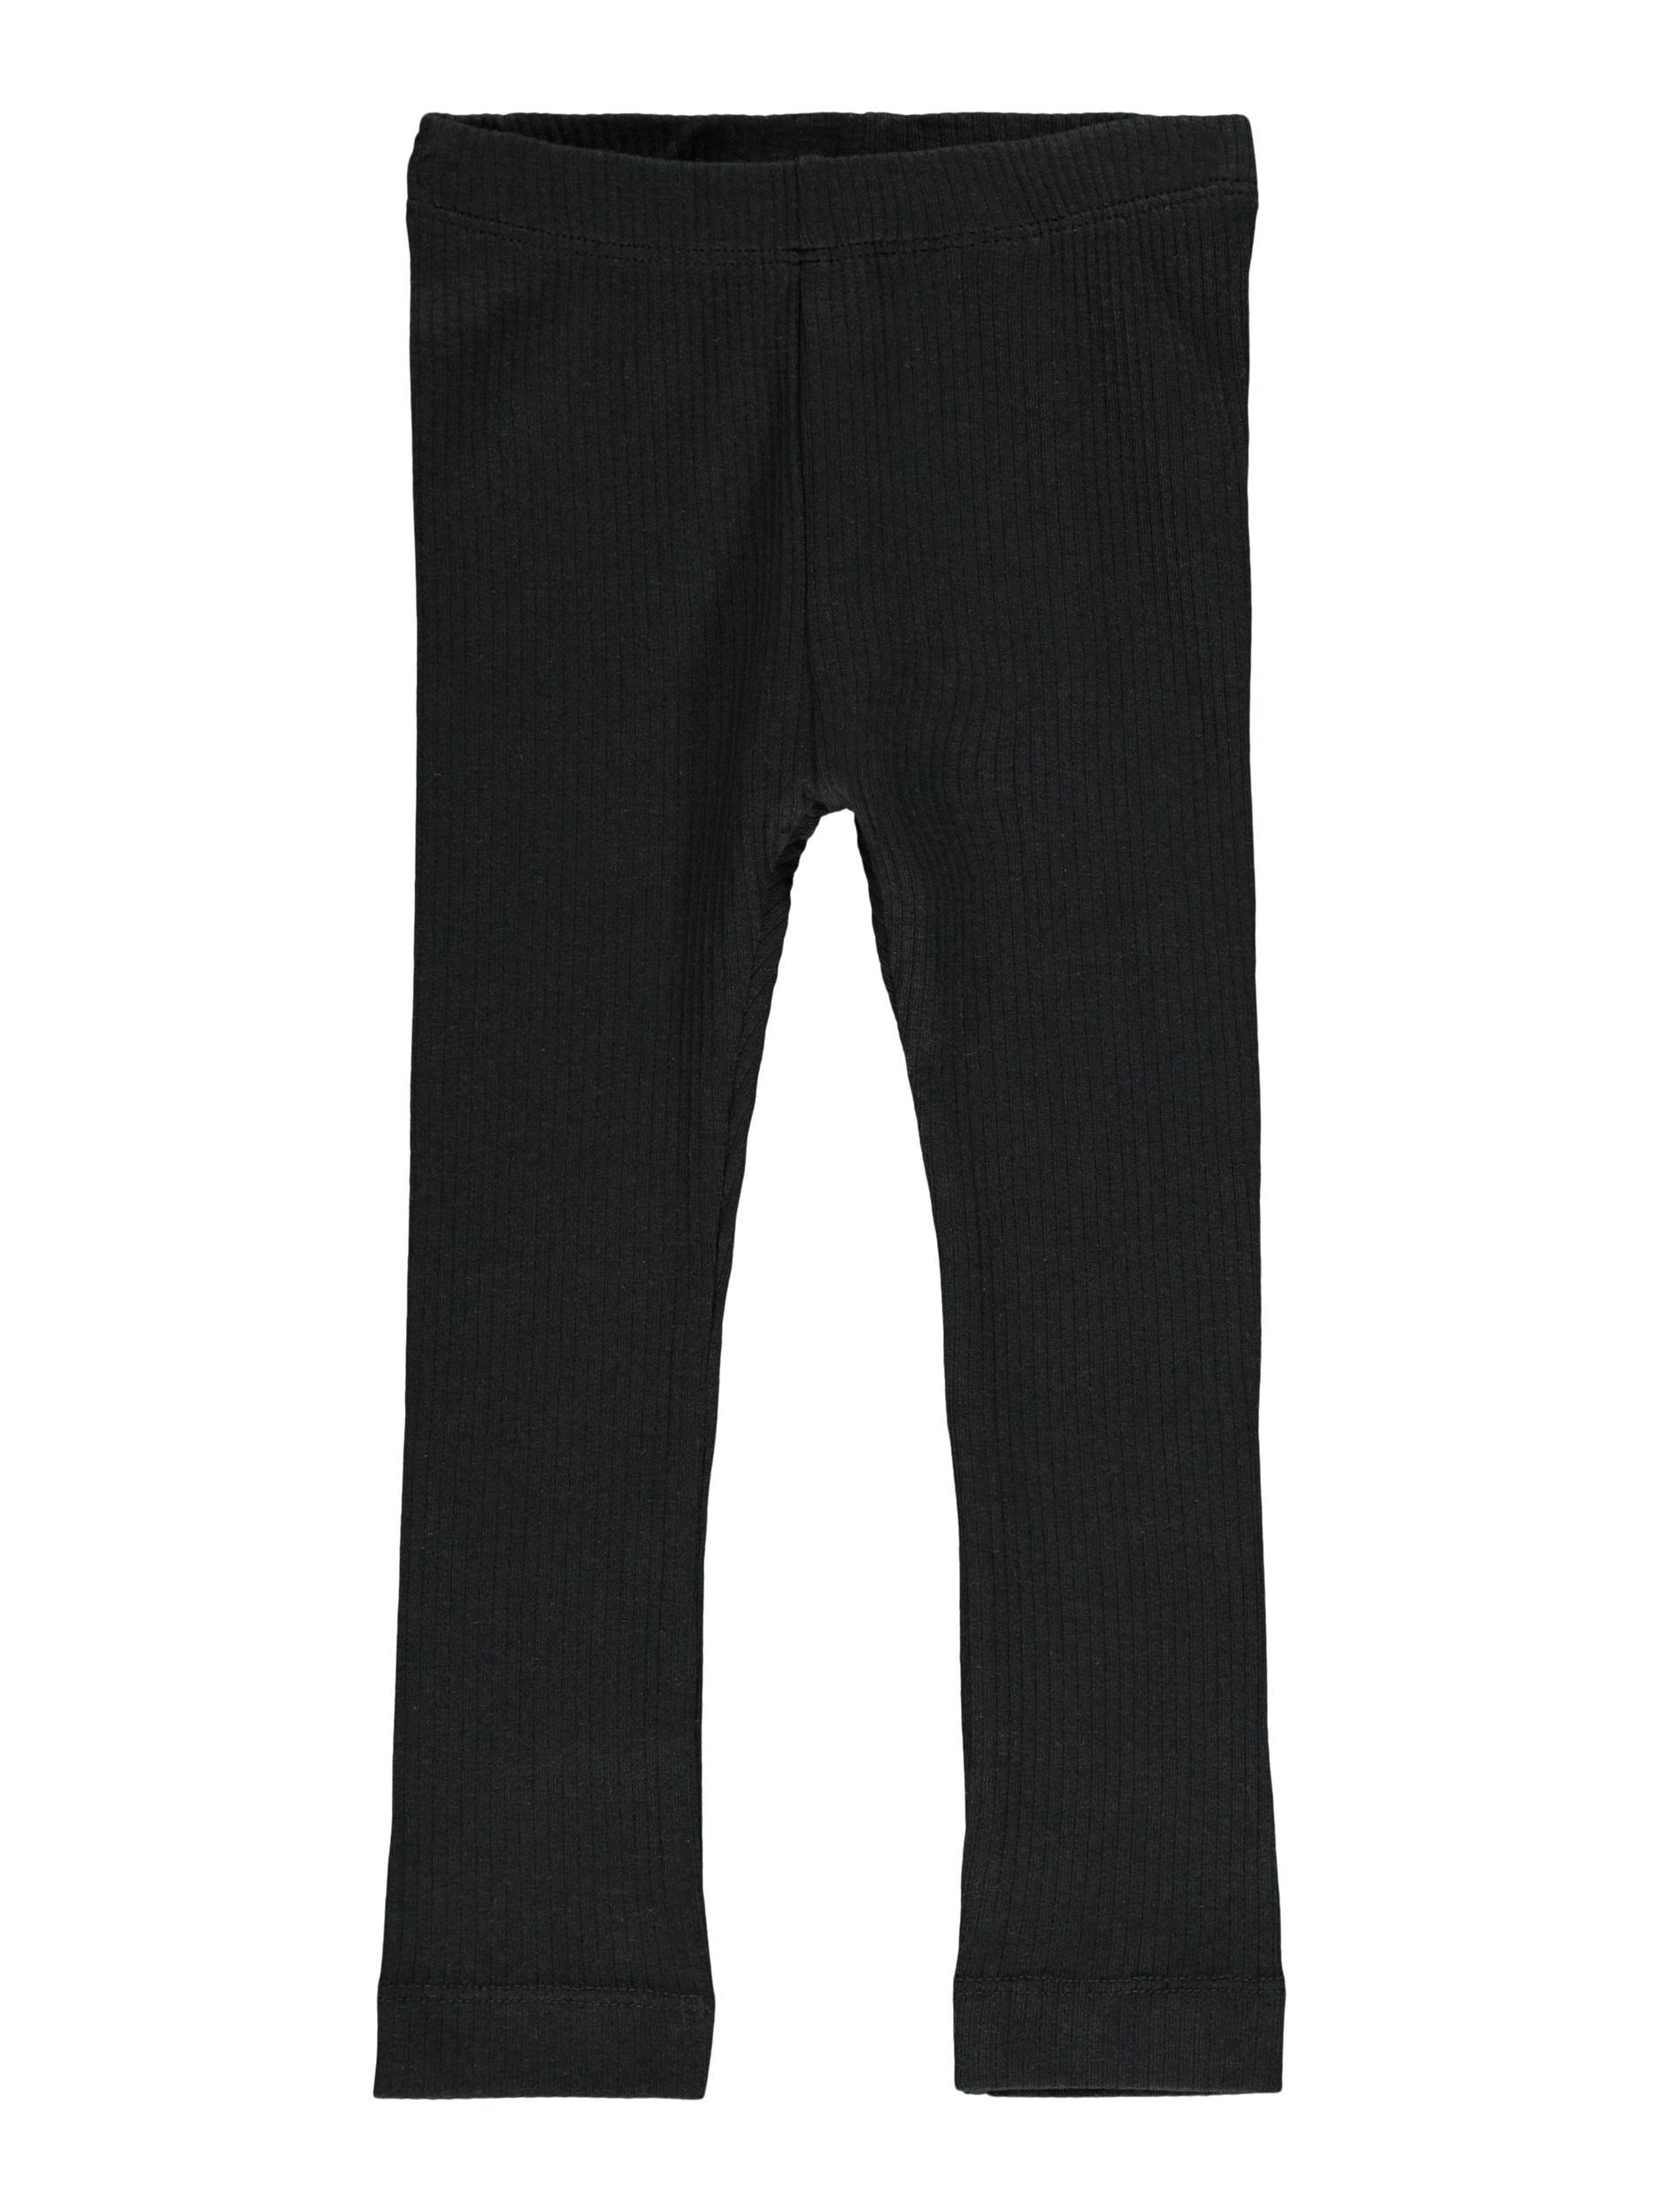 Name It Bille rib leggings, black, 68